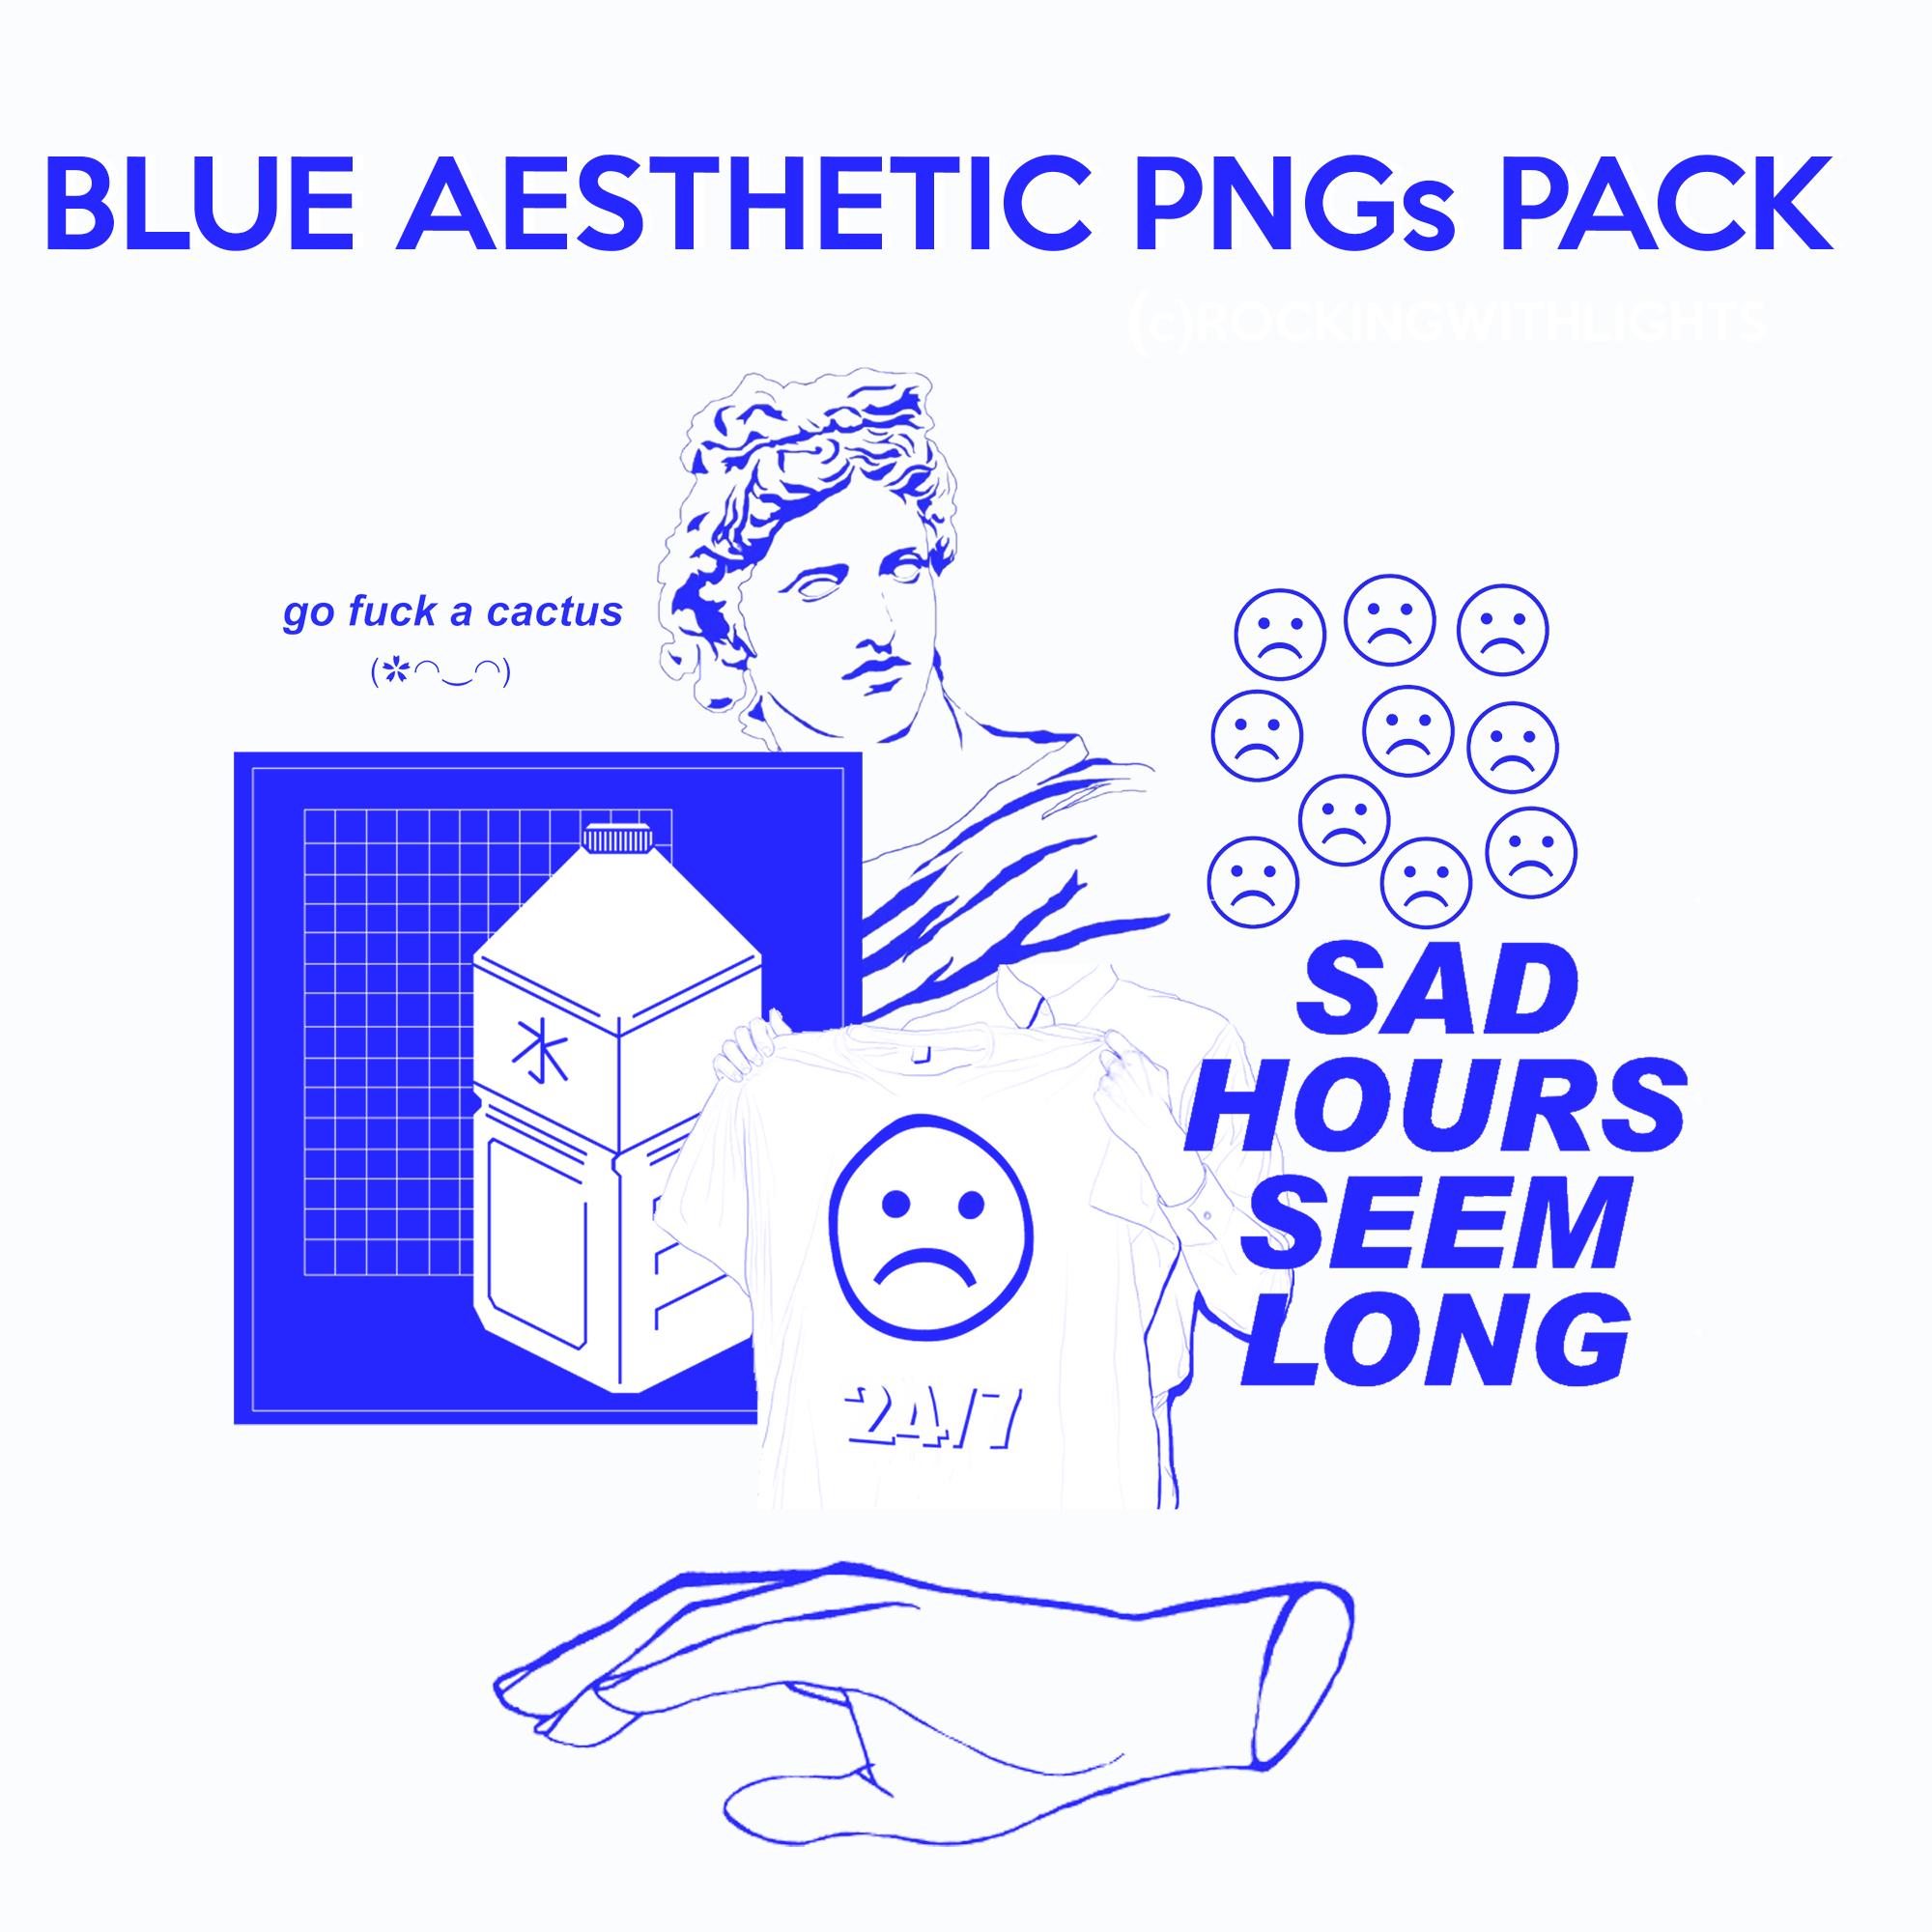    BLUE AESTHETIC PNGs PACK   